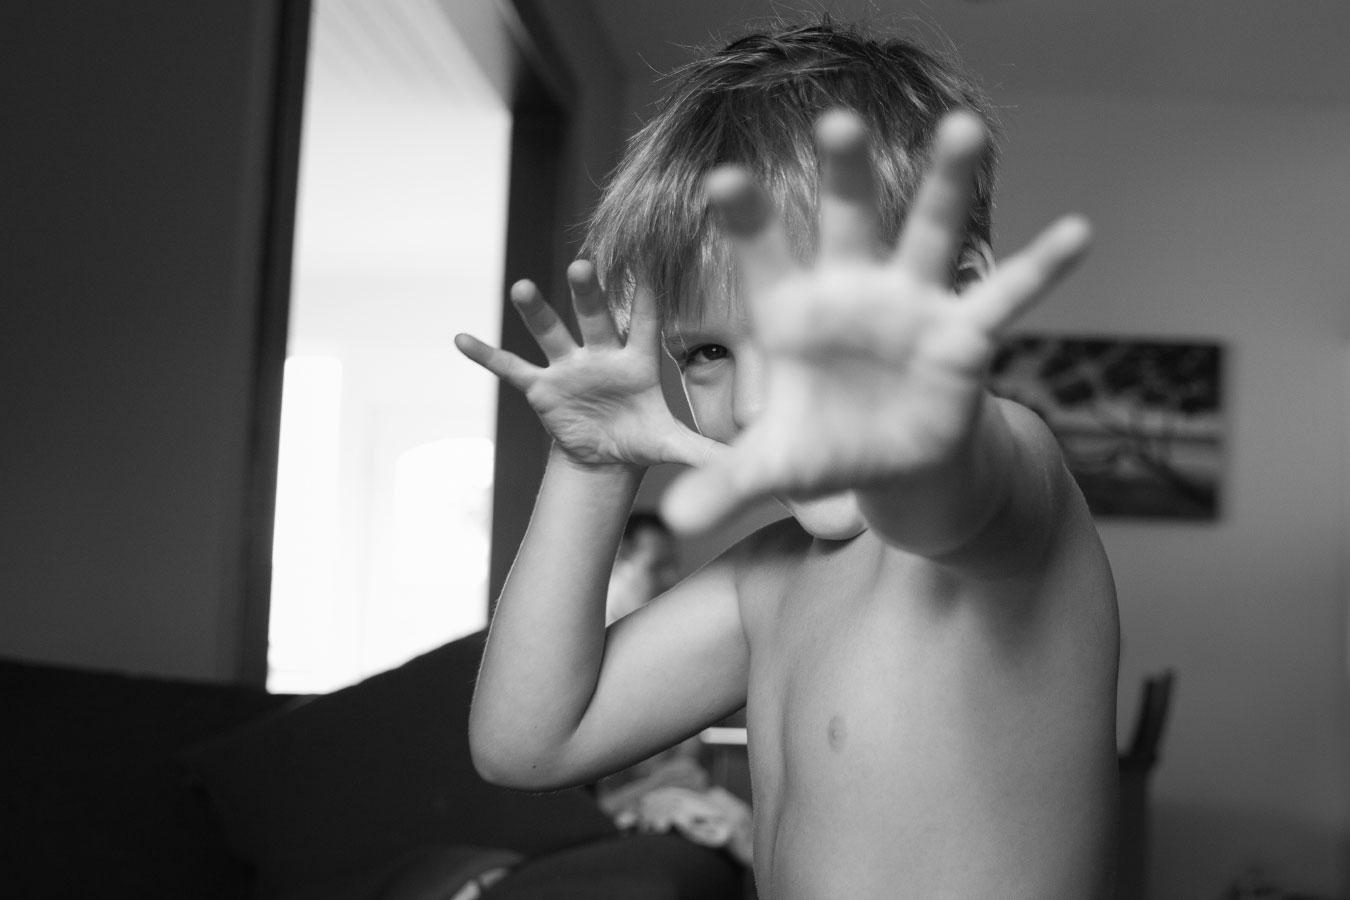 muka-portrait-family-photography-lifestyle-50